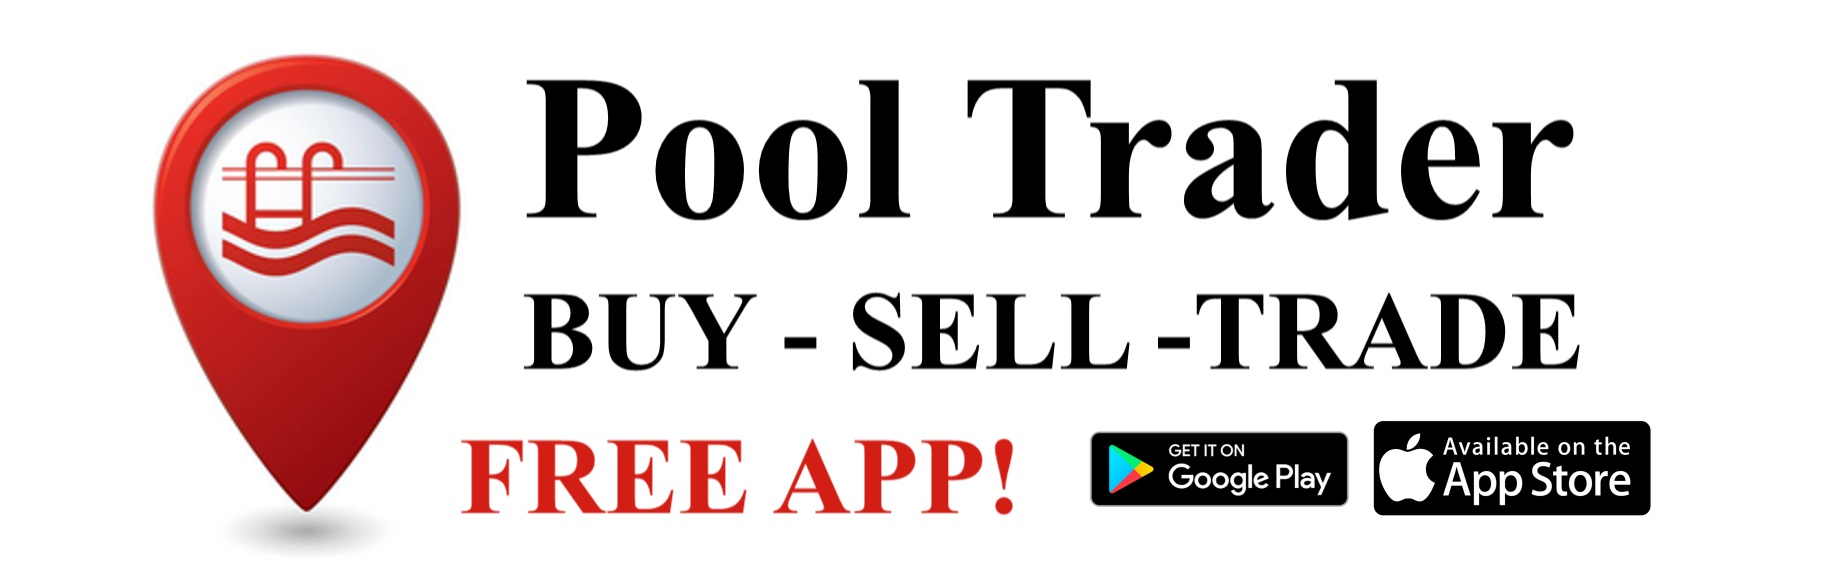 pool trader 2